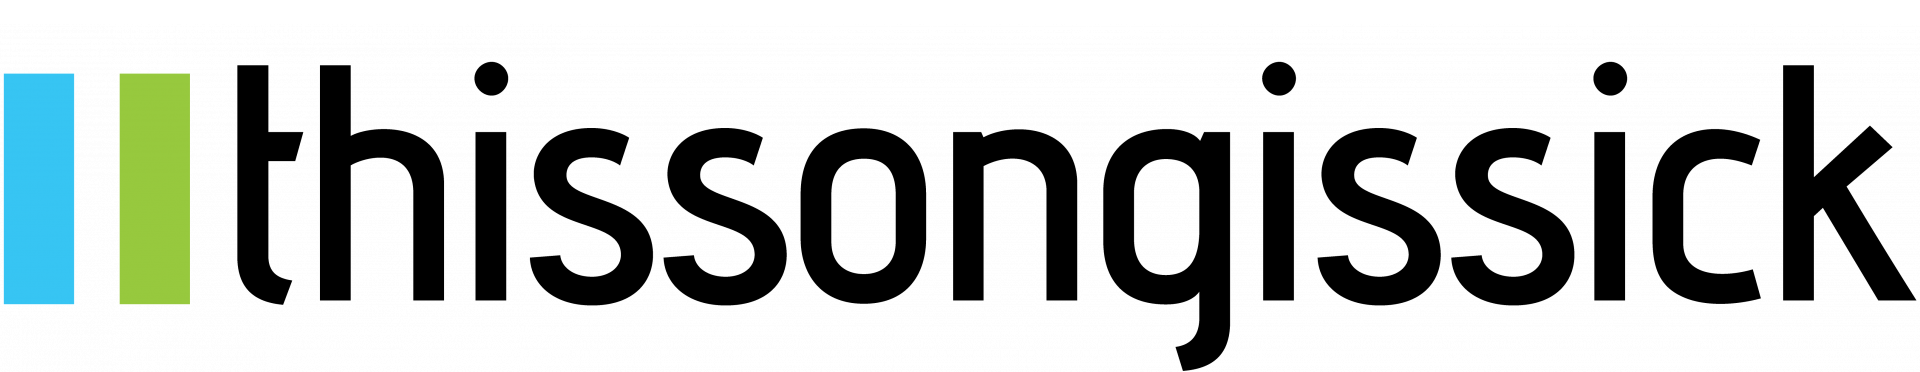 thissongsick-logo-black-PNG-2000x372-1.png